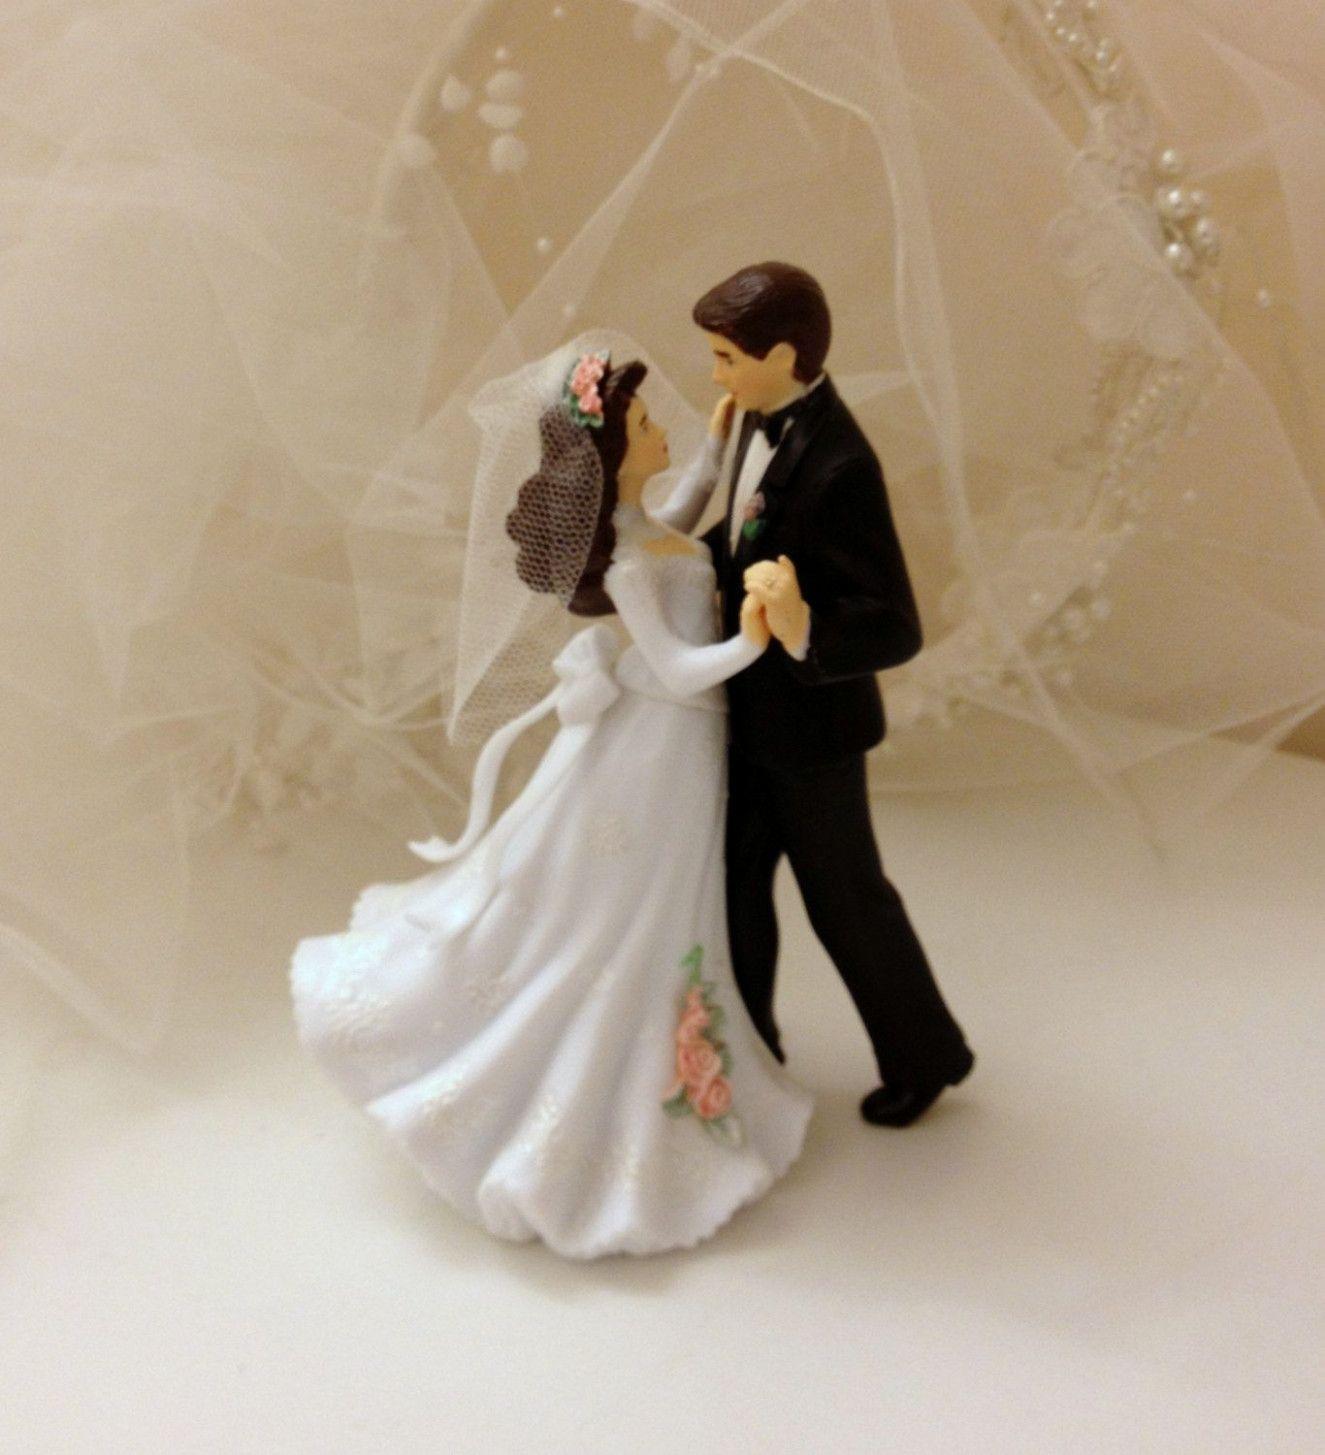 Classic Wedding Photos Bride Groom Cake Topper Wedding Romantic Vintage Wedding Cake Topper Wedding Cakes Vintage